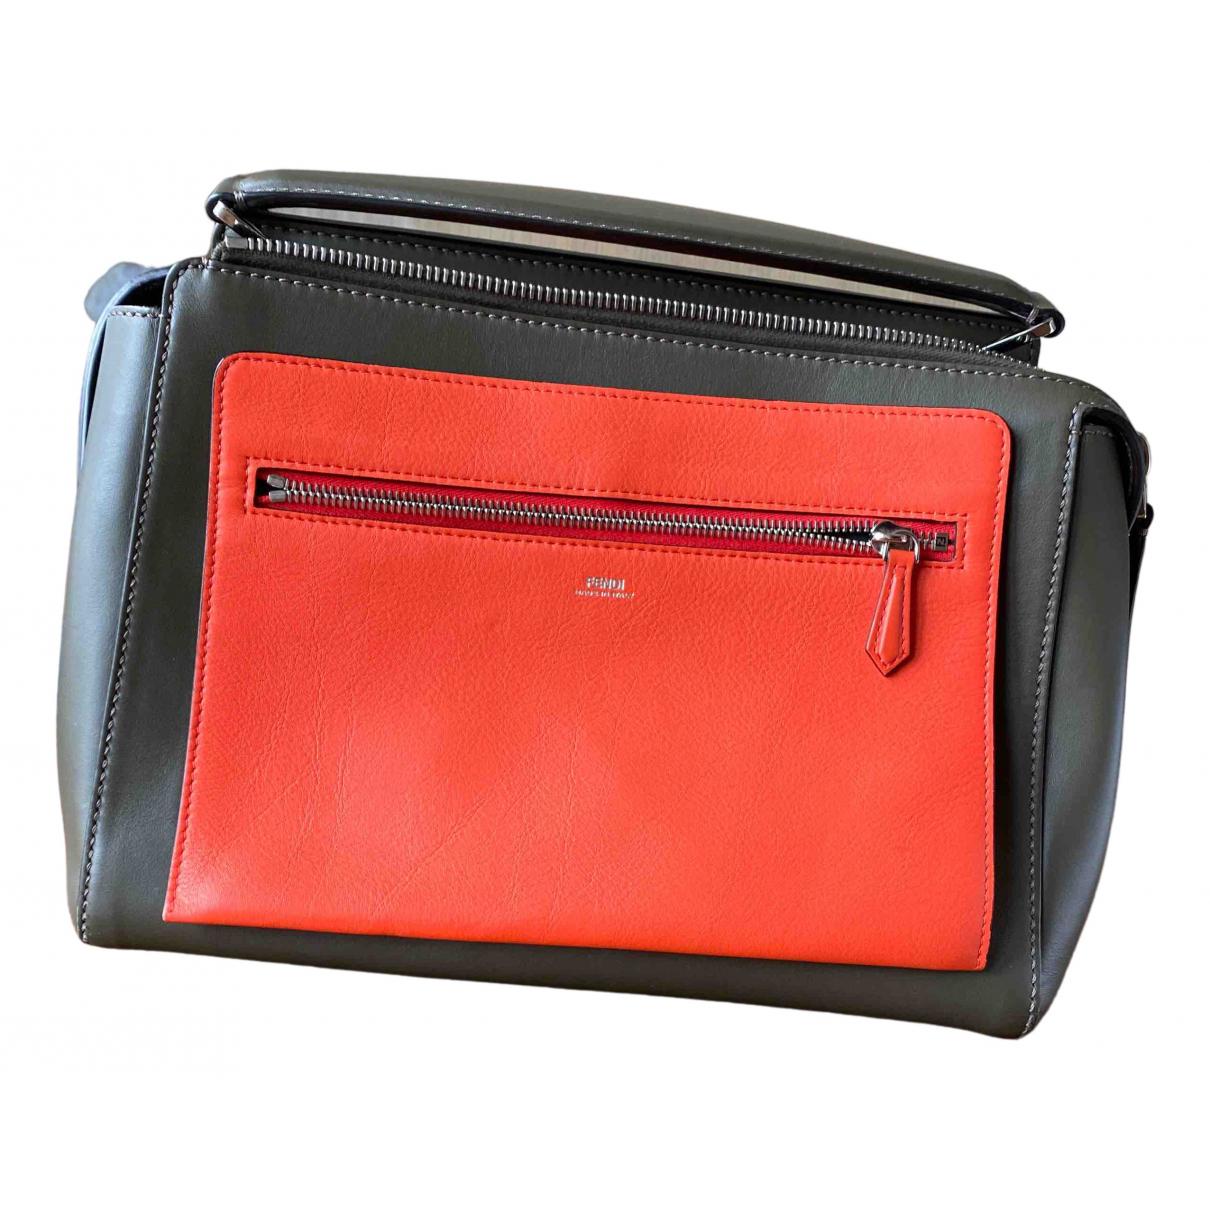 Fendi Dot Com Grey Leather handbag for Women N